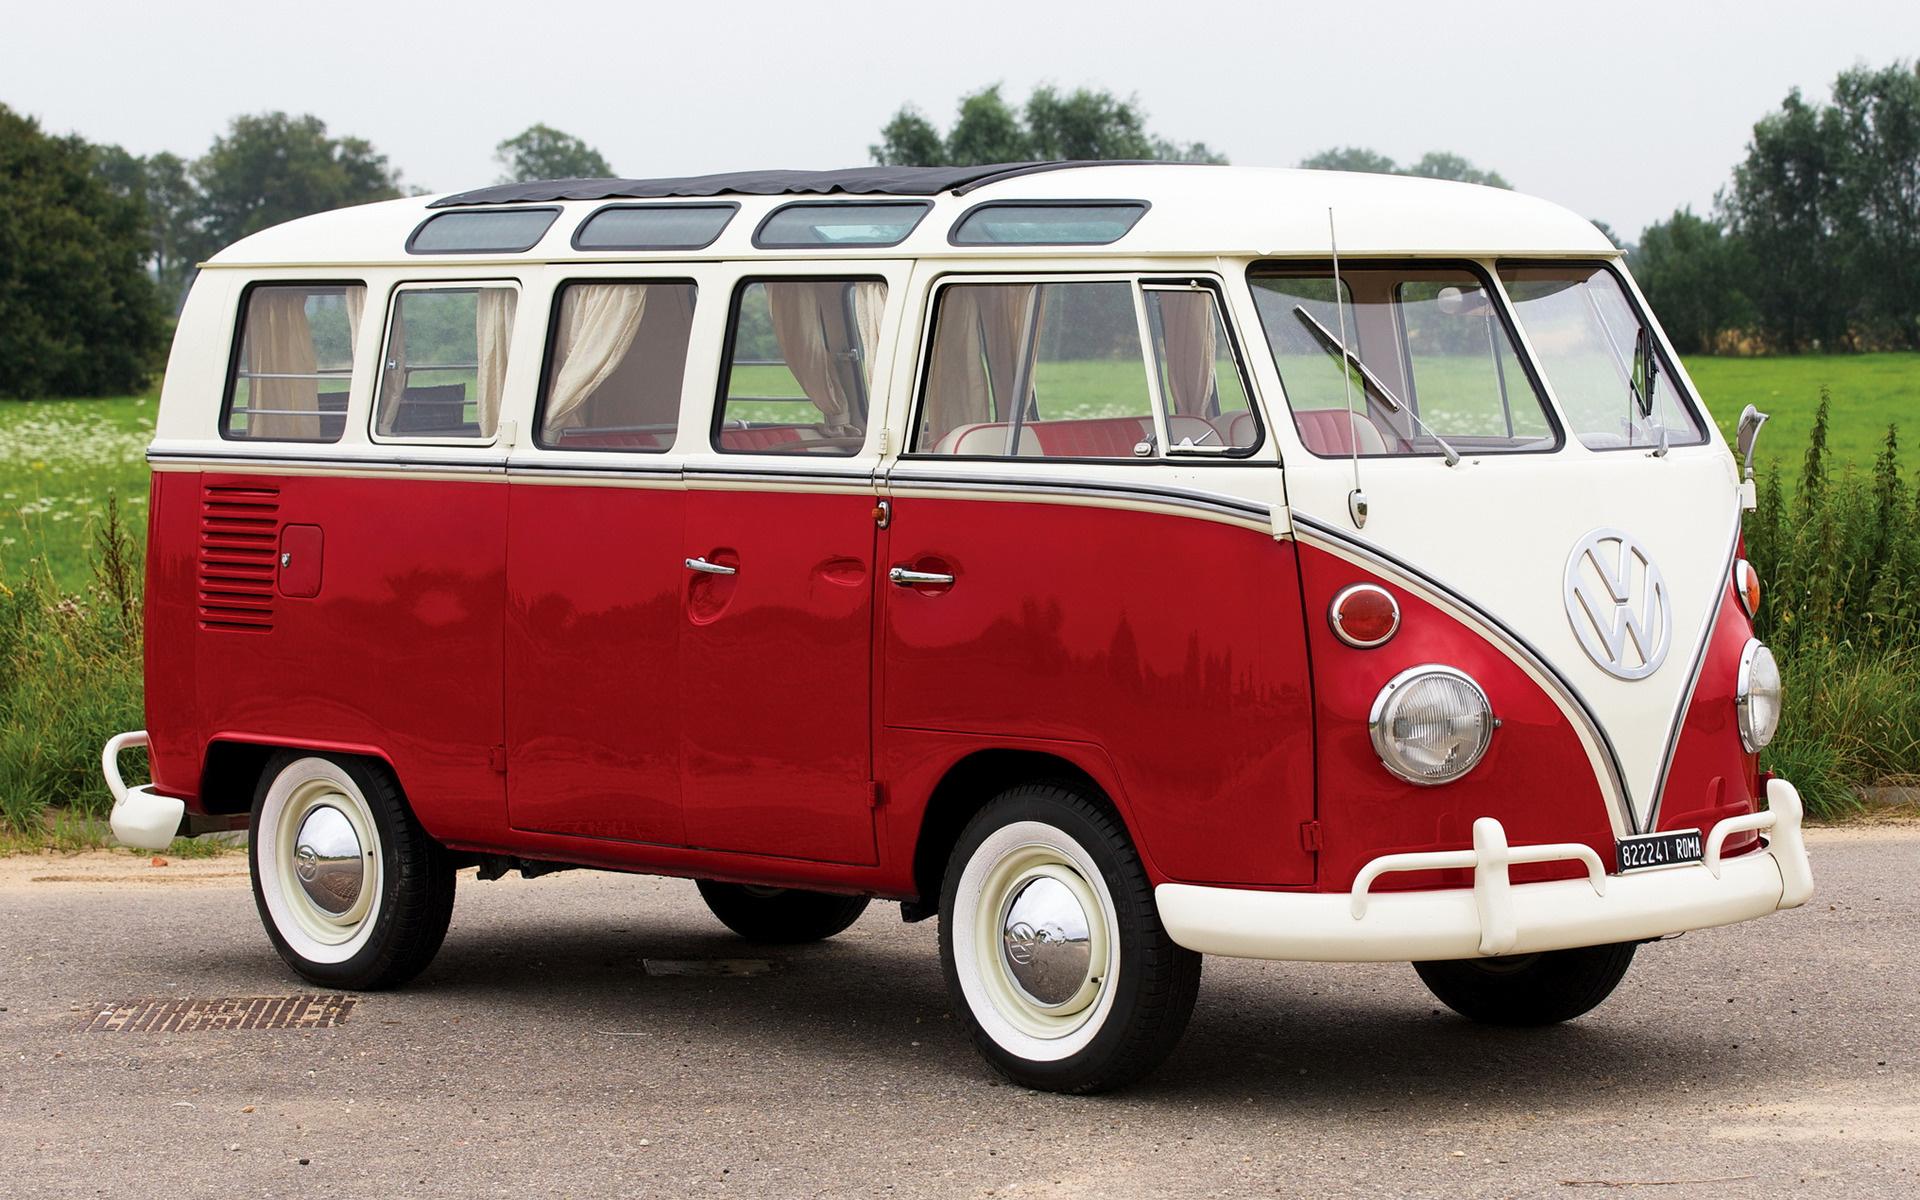 Volkswagen T1 Deluxe Microbus (1964) Wallpapers and HD Images - Car Pixel